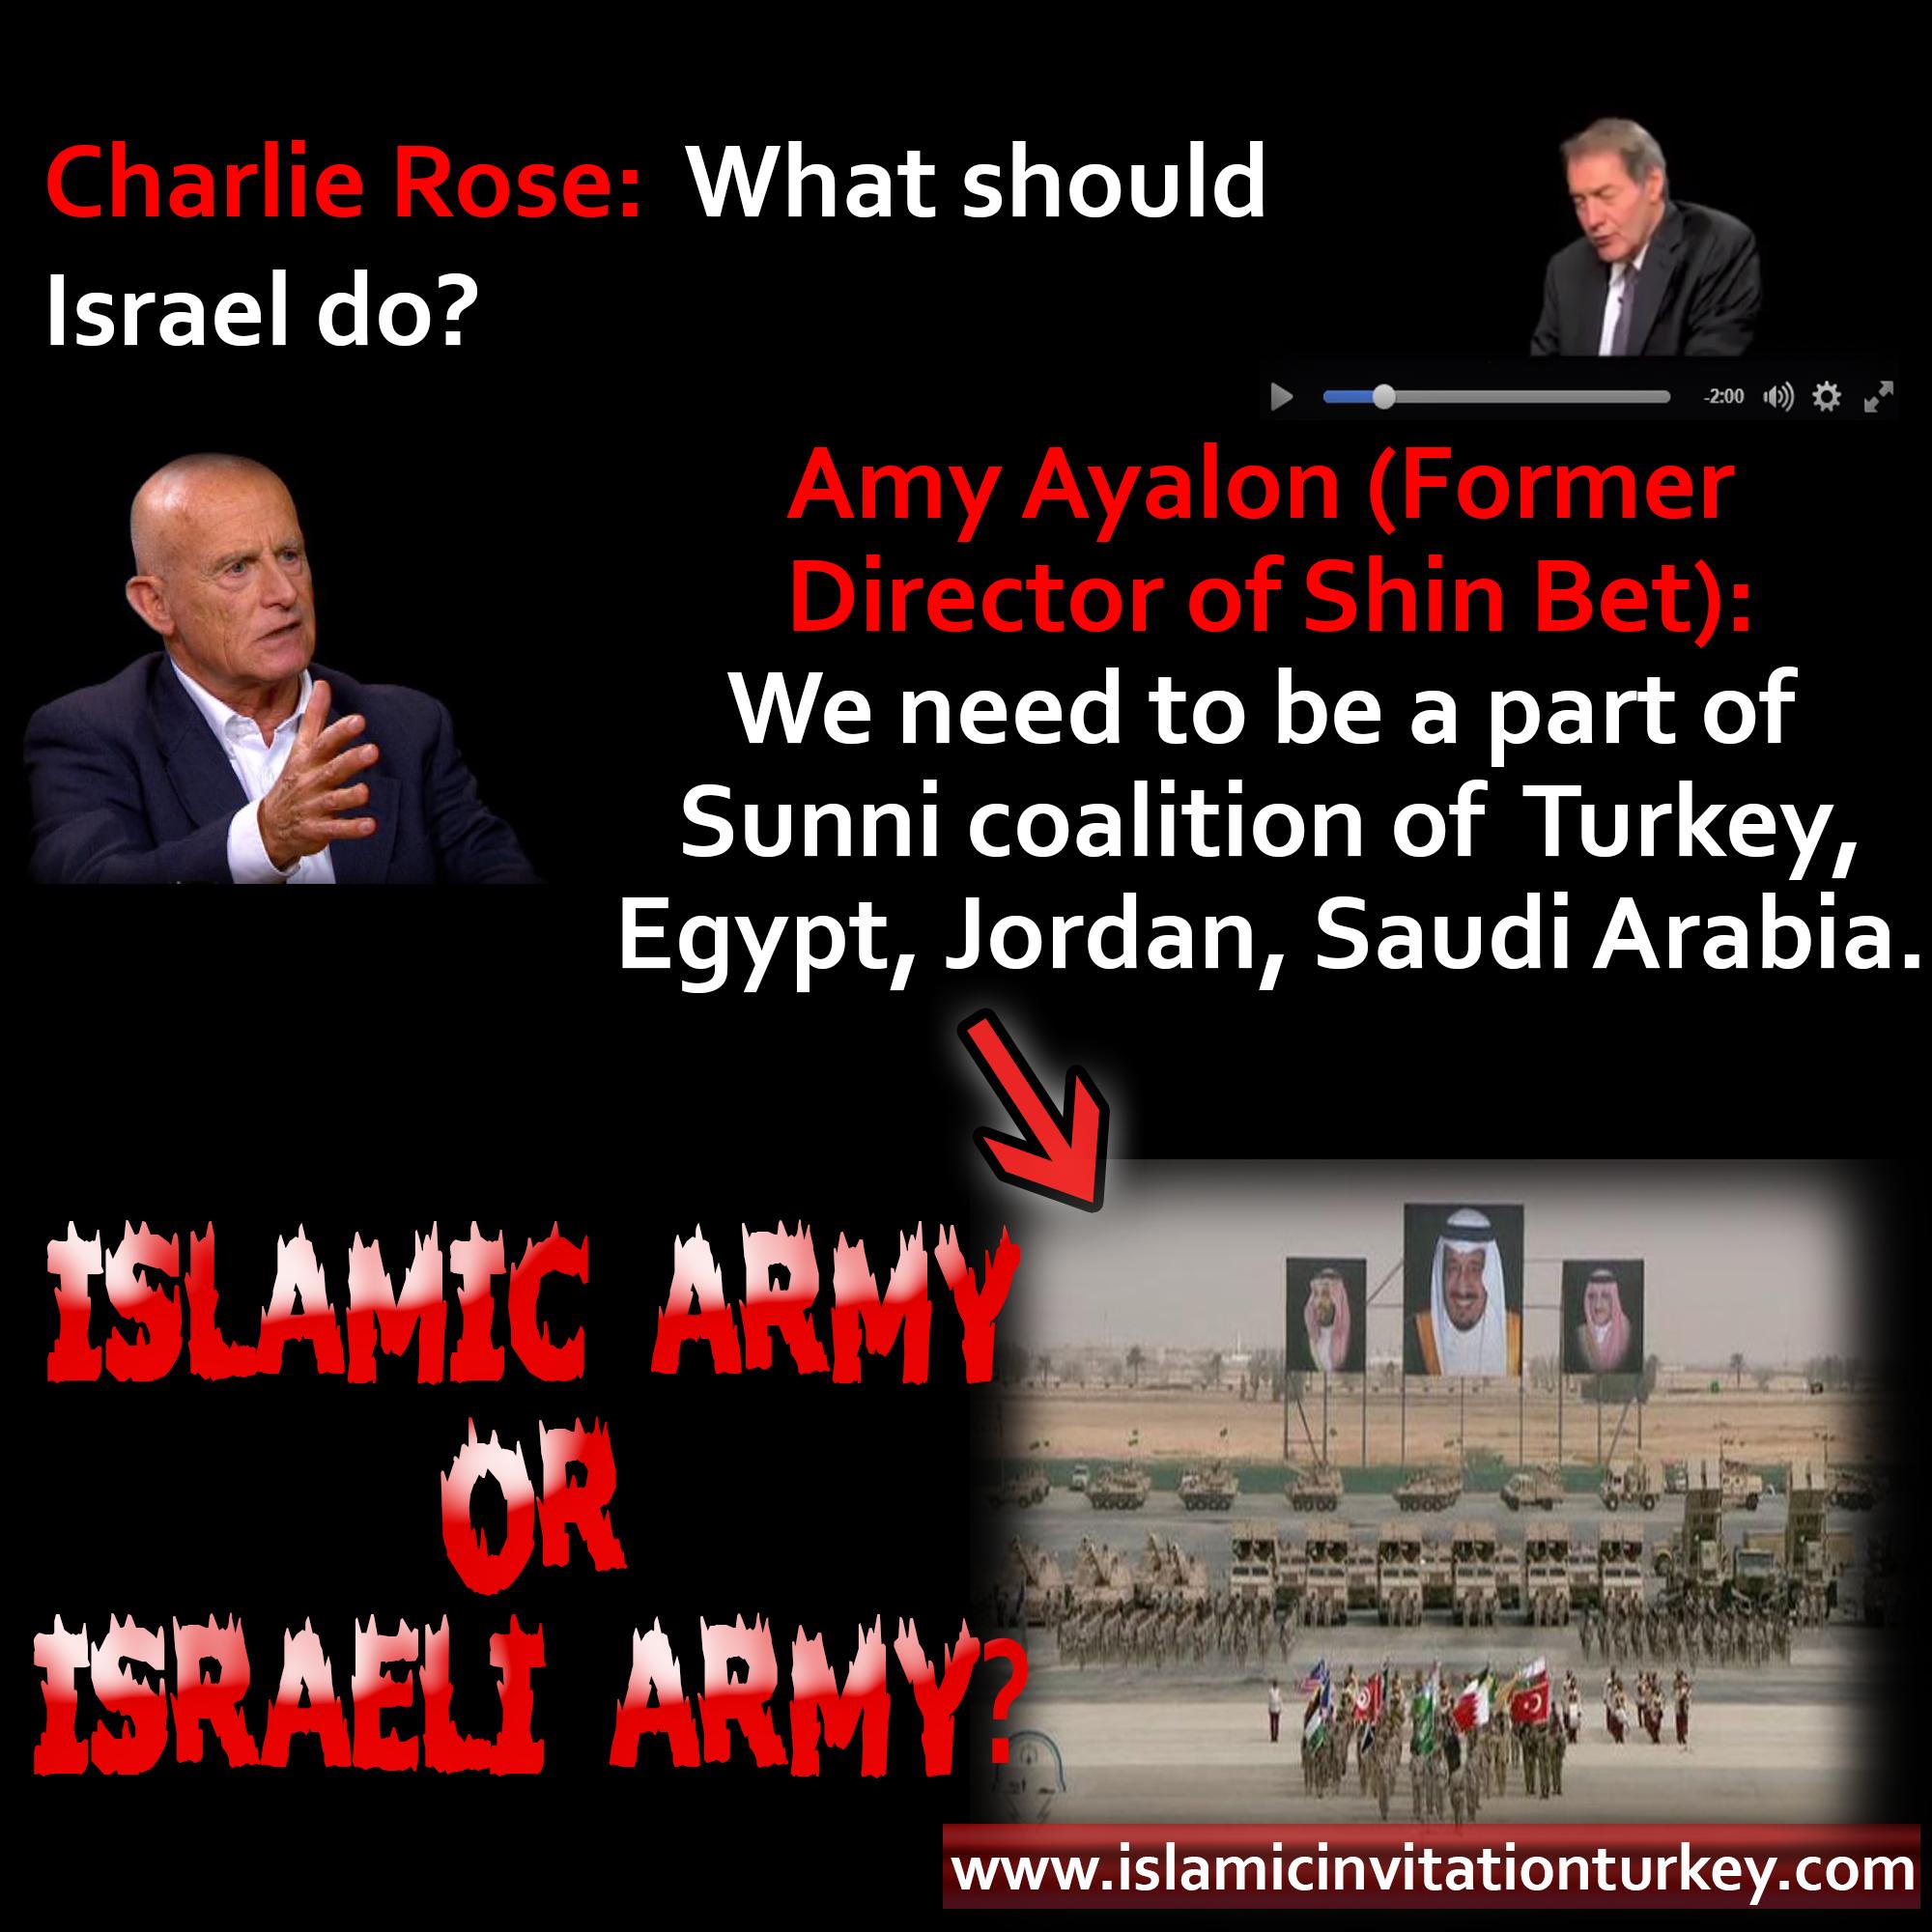 mohammad army or israeli army